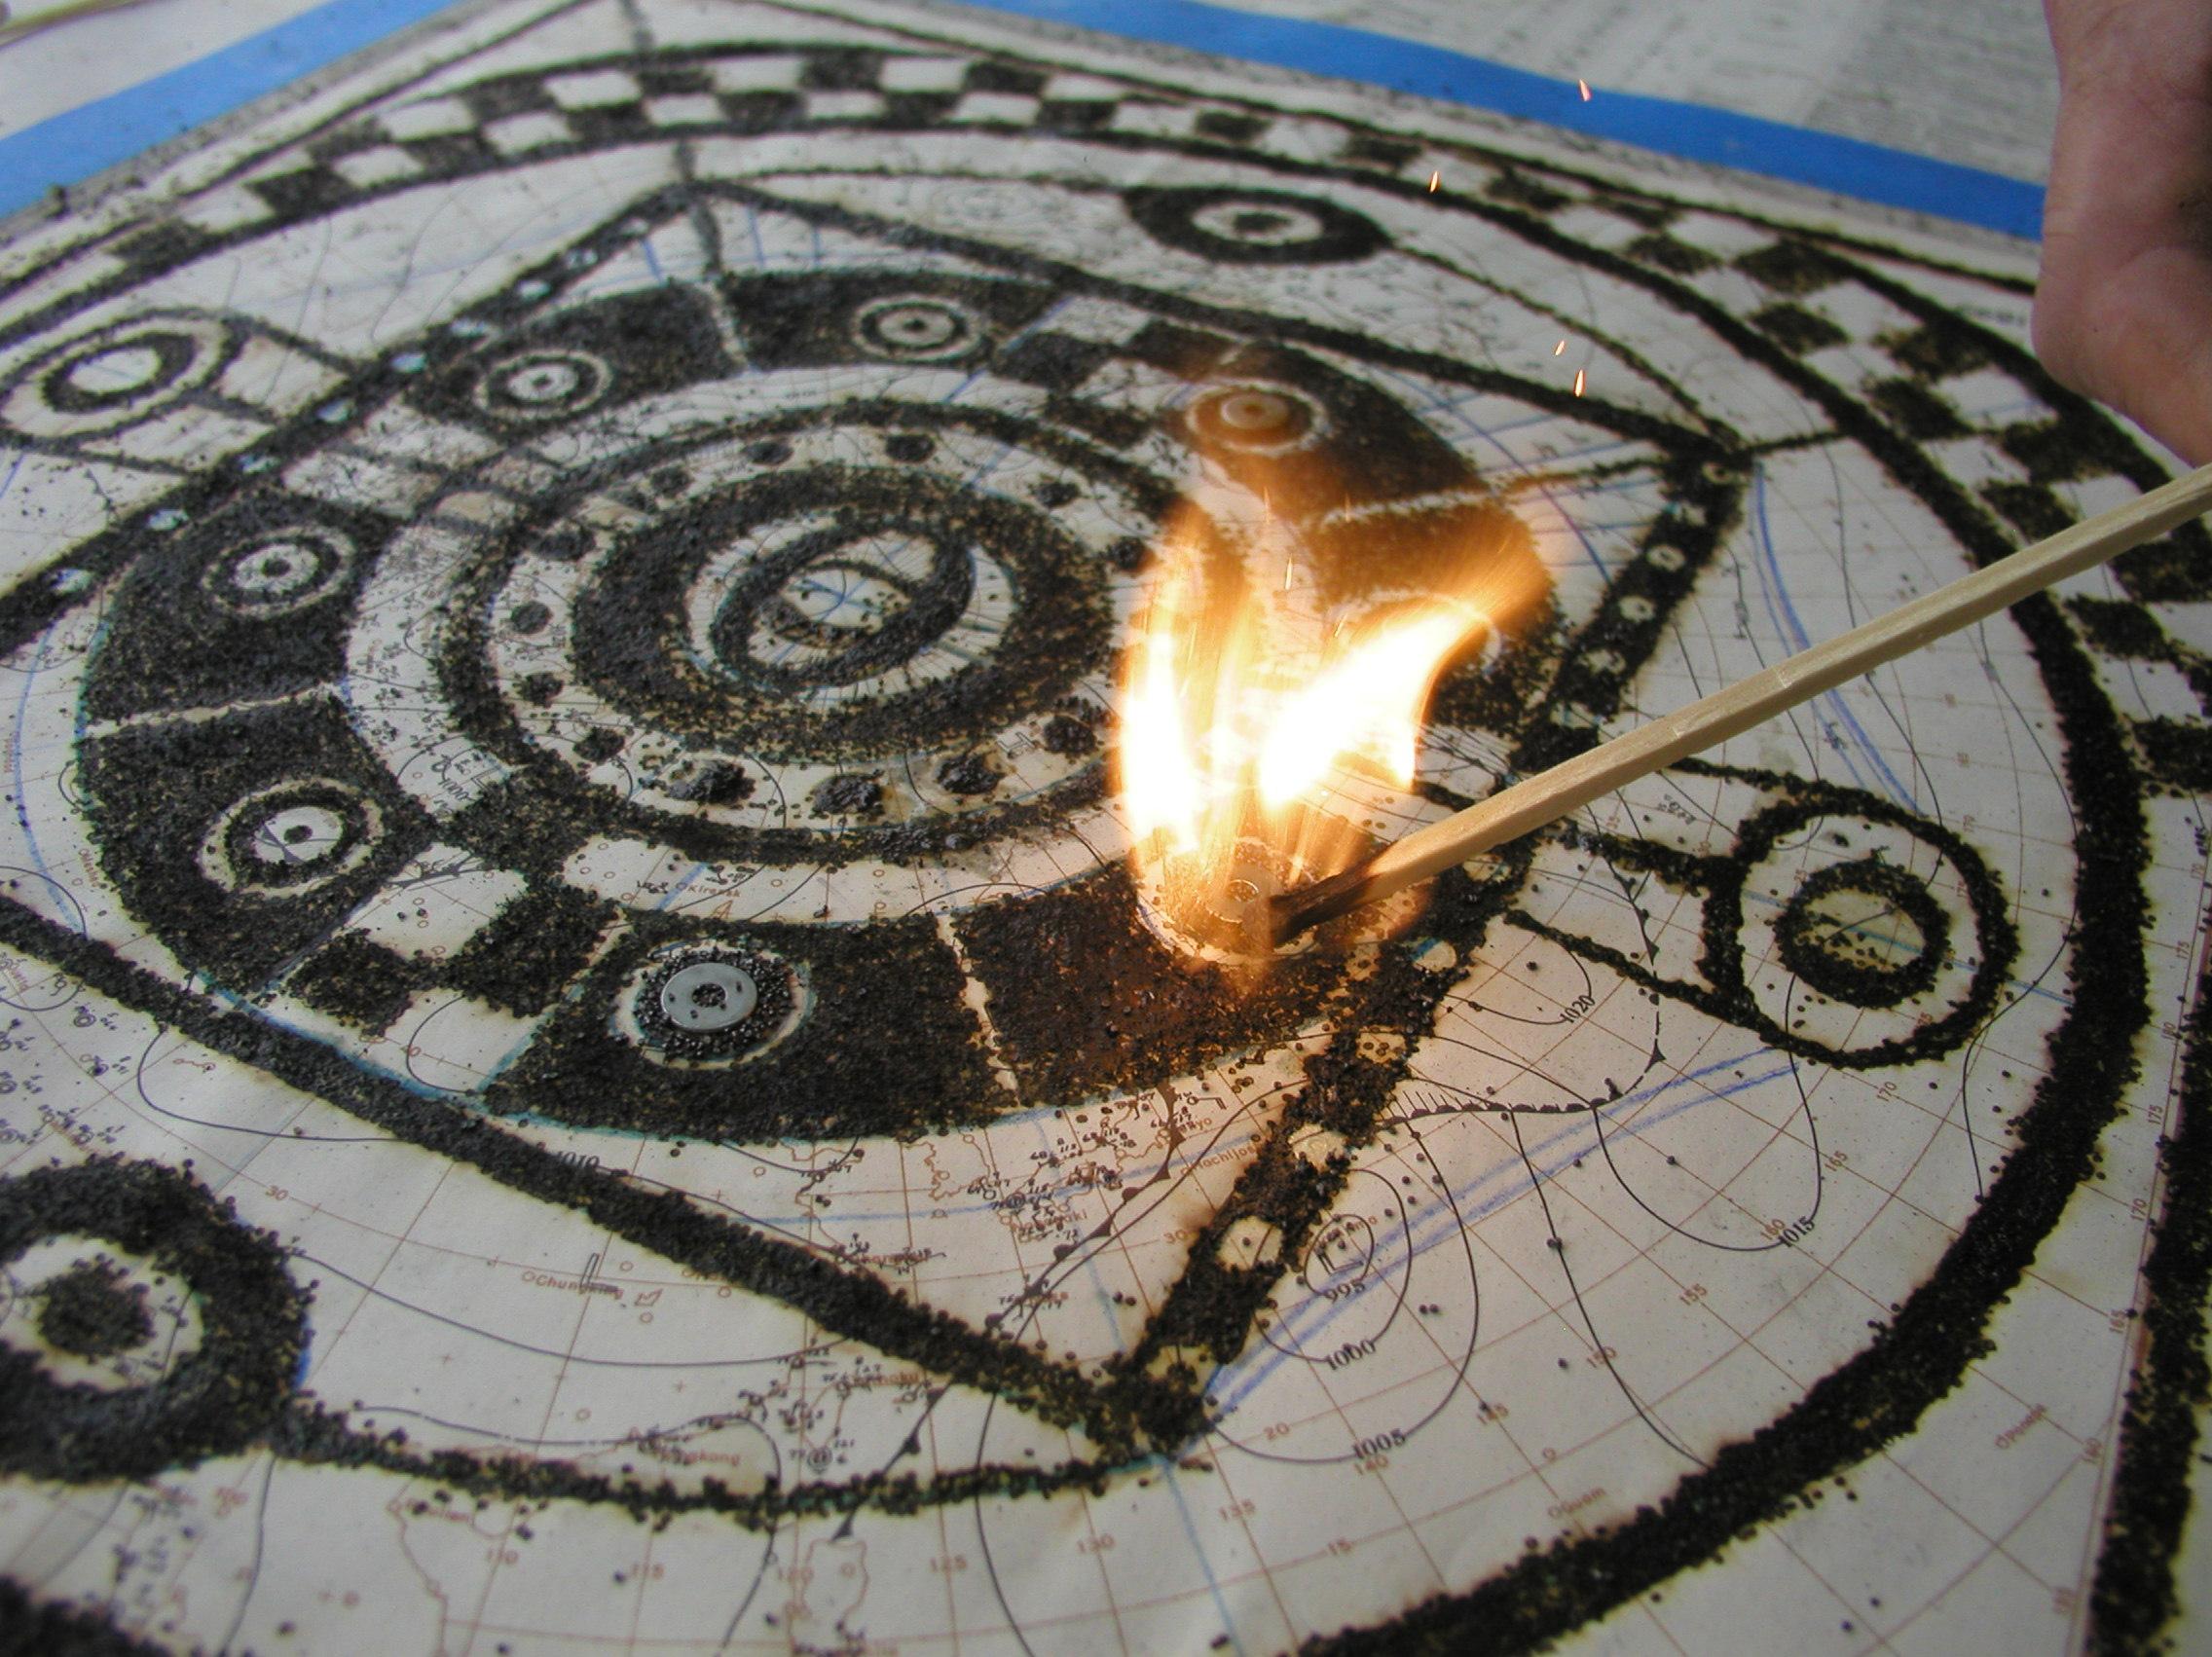 EVIL EYE Mandala in process